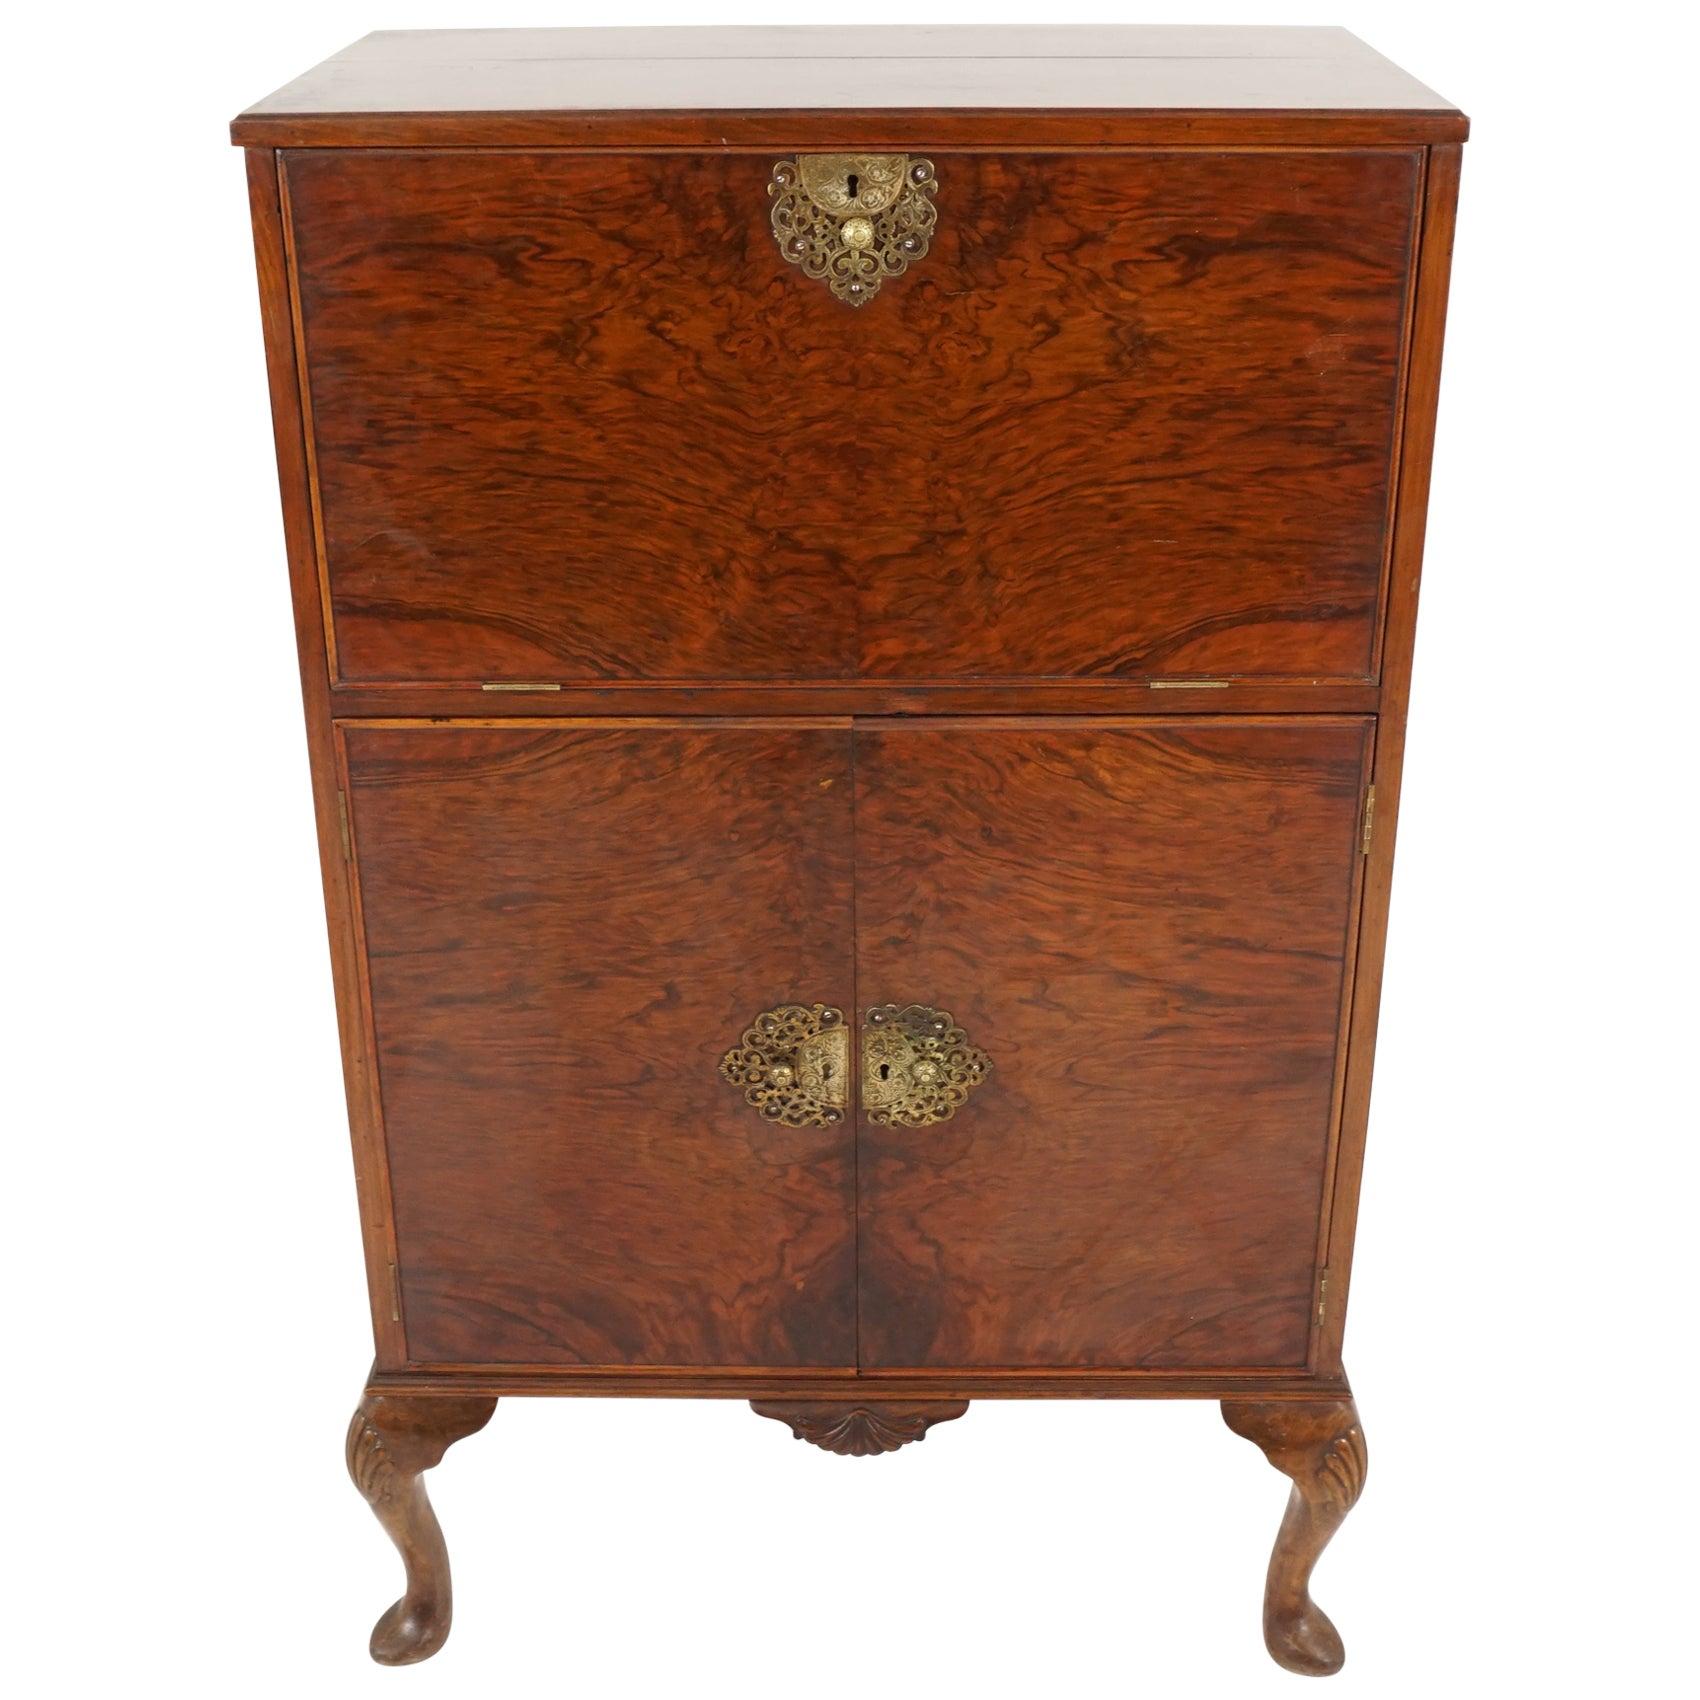 "Vintage Art Deco Burr Walnut Cocktail Cabinet ""Aw-Lyn"" Scotland 1930, B2181"